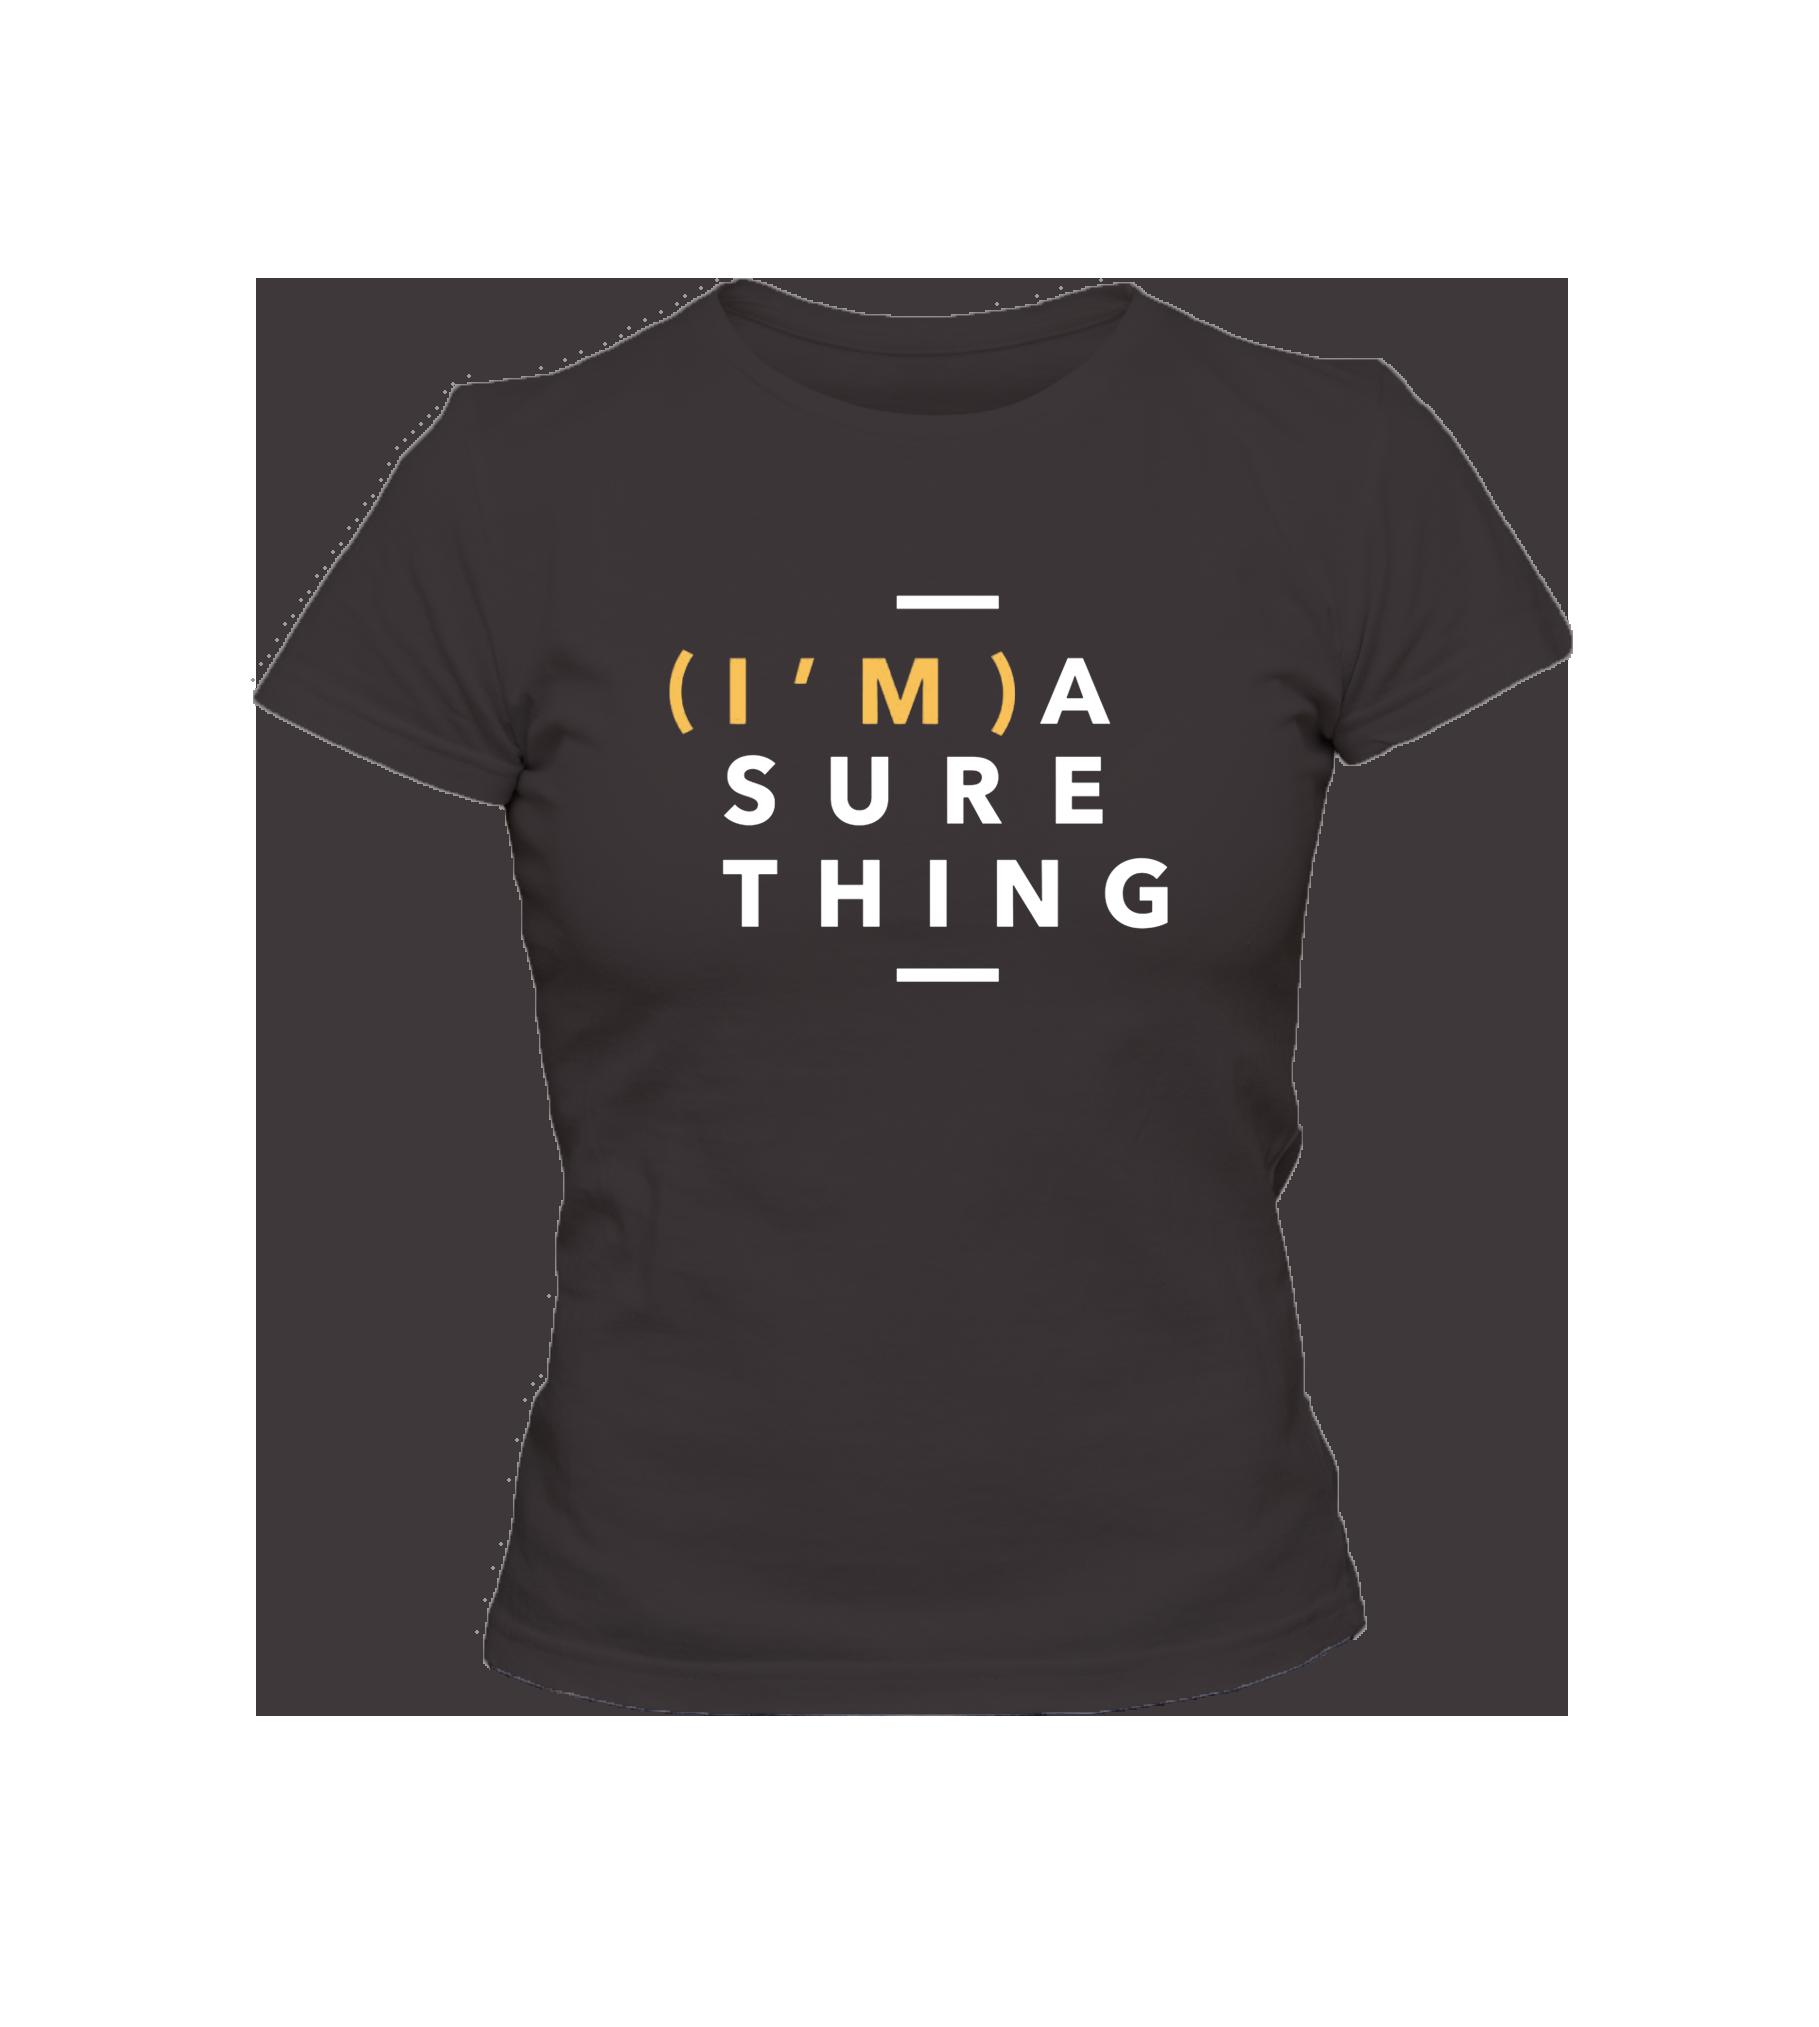 Sure Thing - MU.png